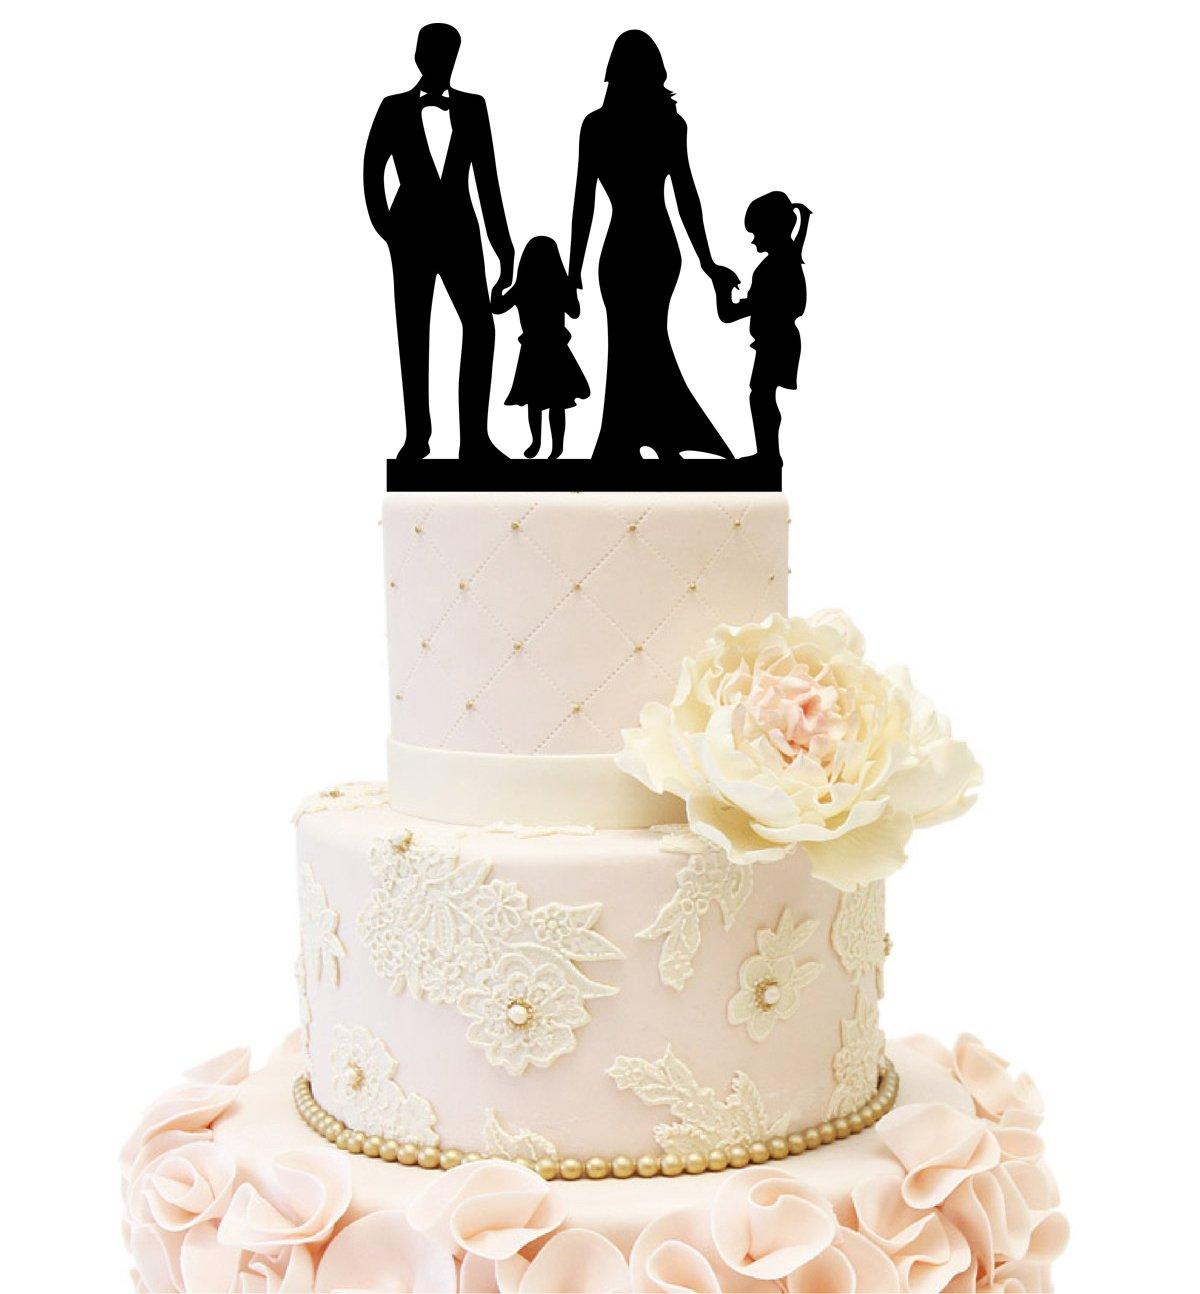 Amazon.com: Wedding Anniversary Cake Topper couple with 2 kids (2 ...